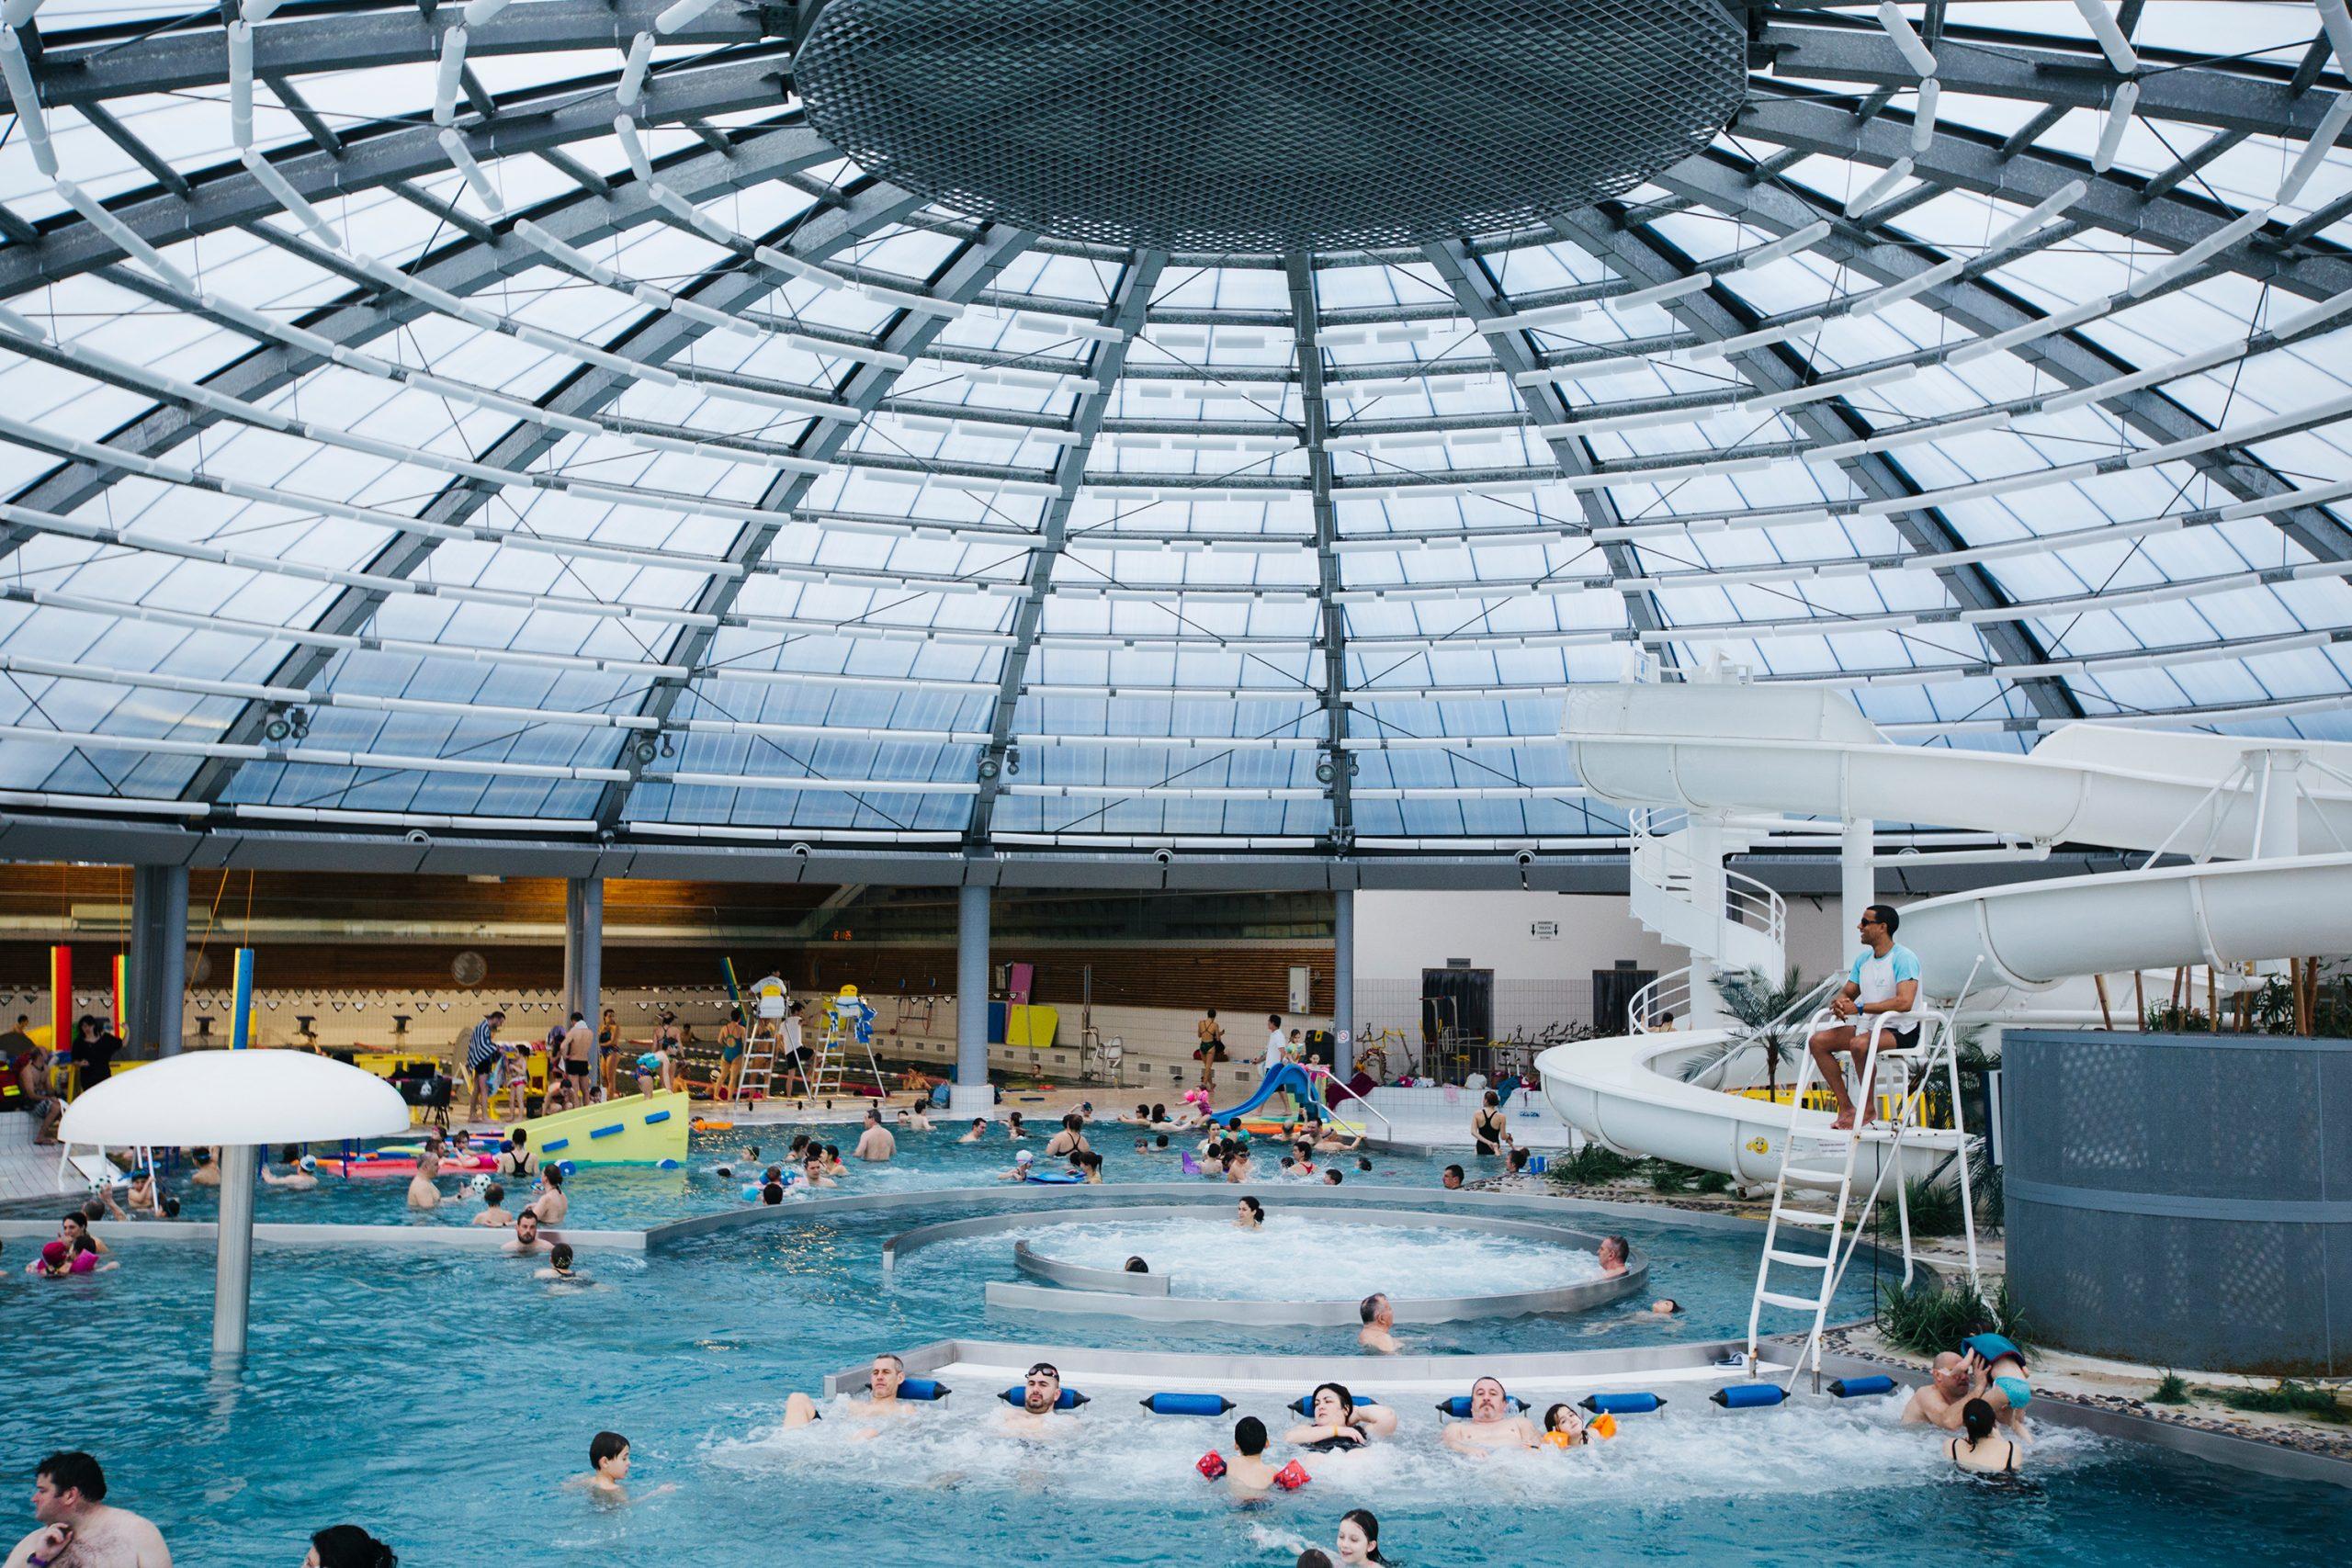 Stade Aquatique - Stade Aquatique intérieur Piscine Bellerive Horaire